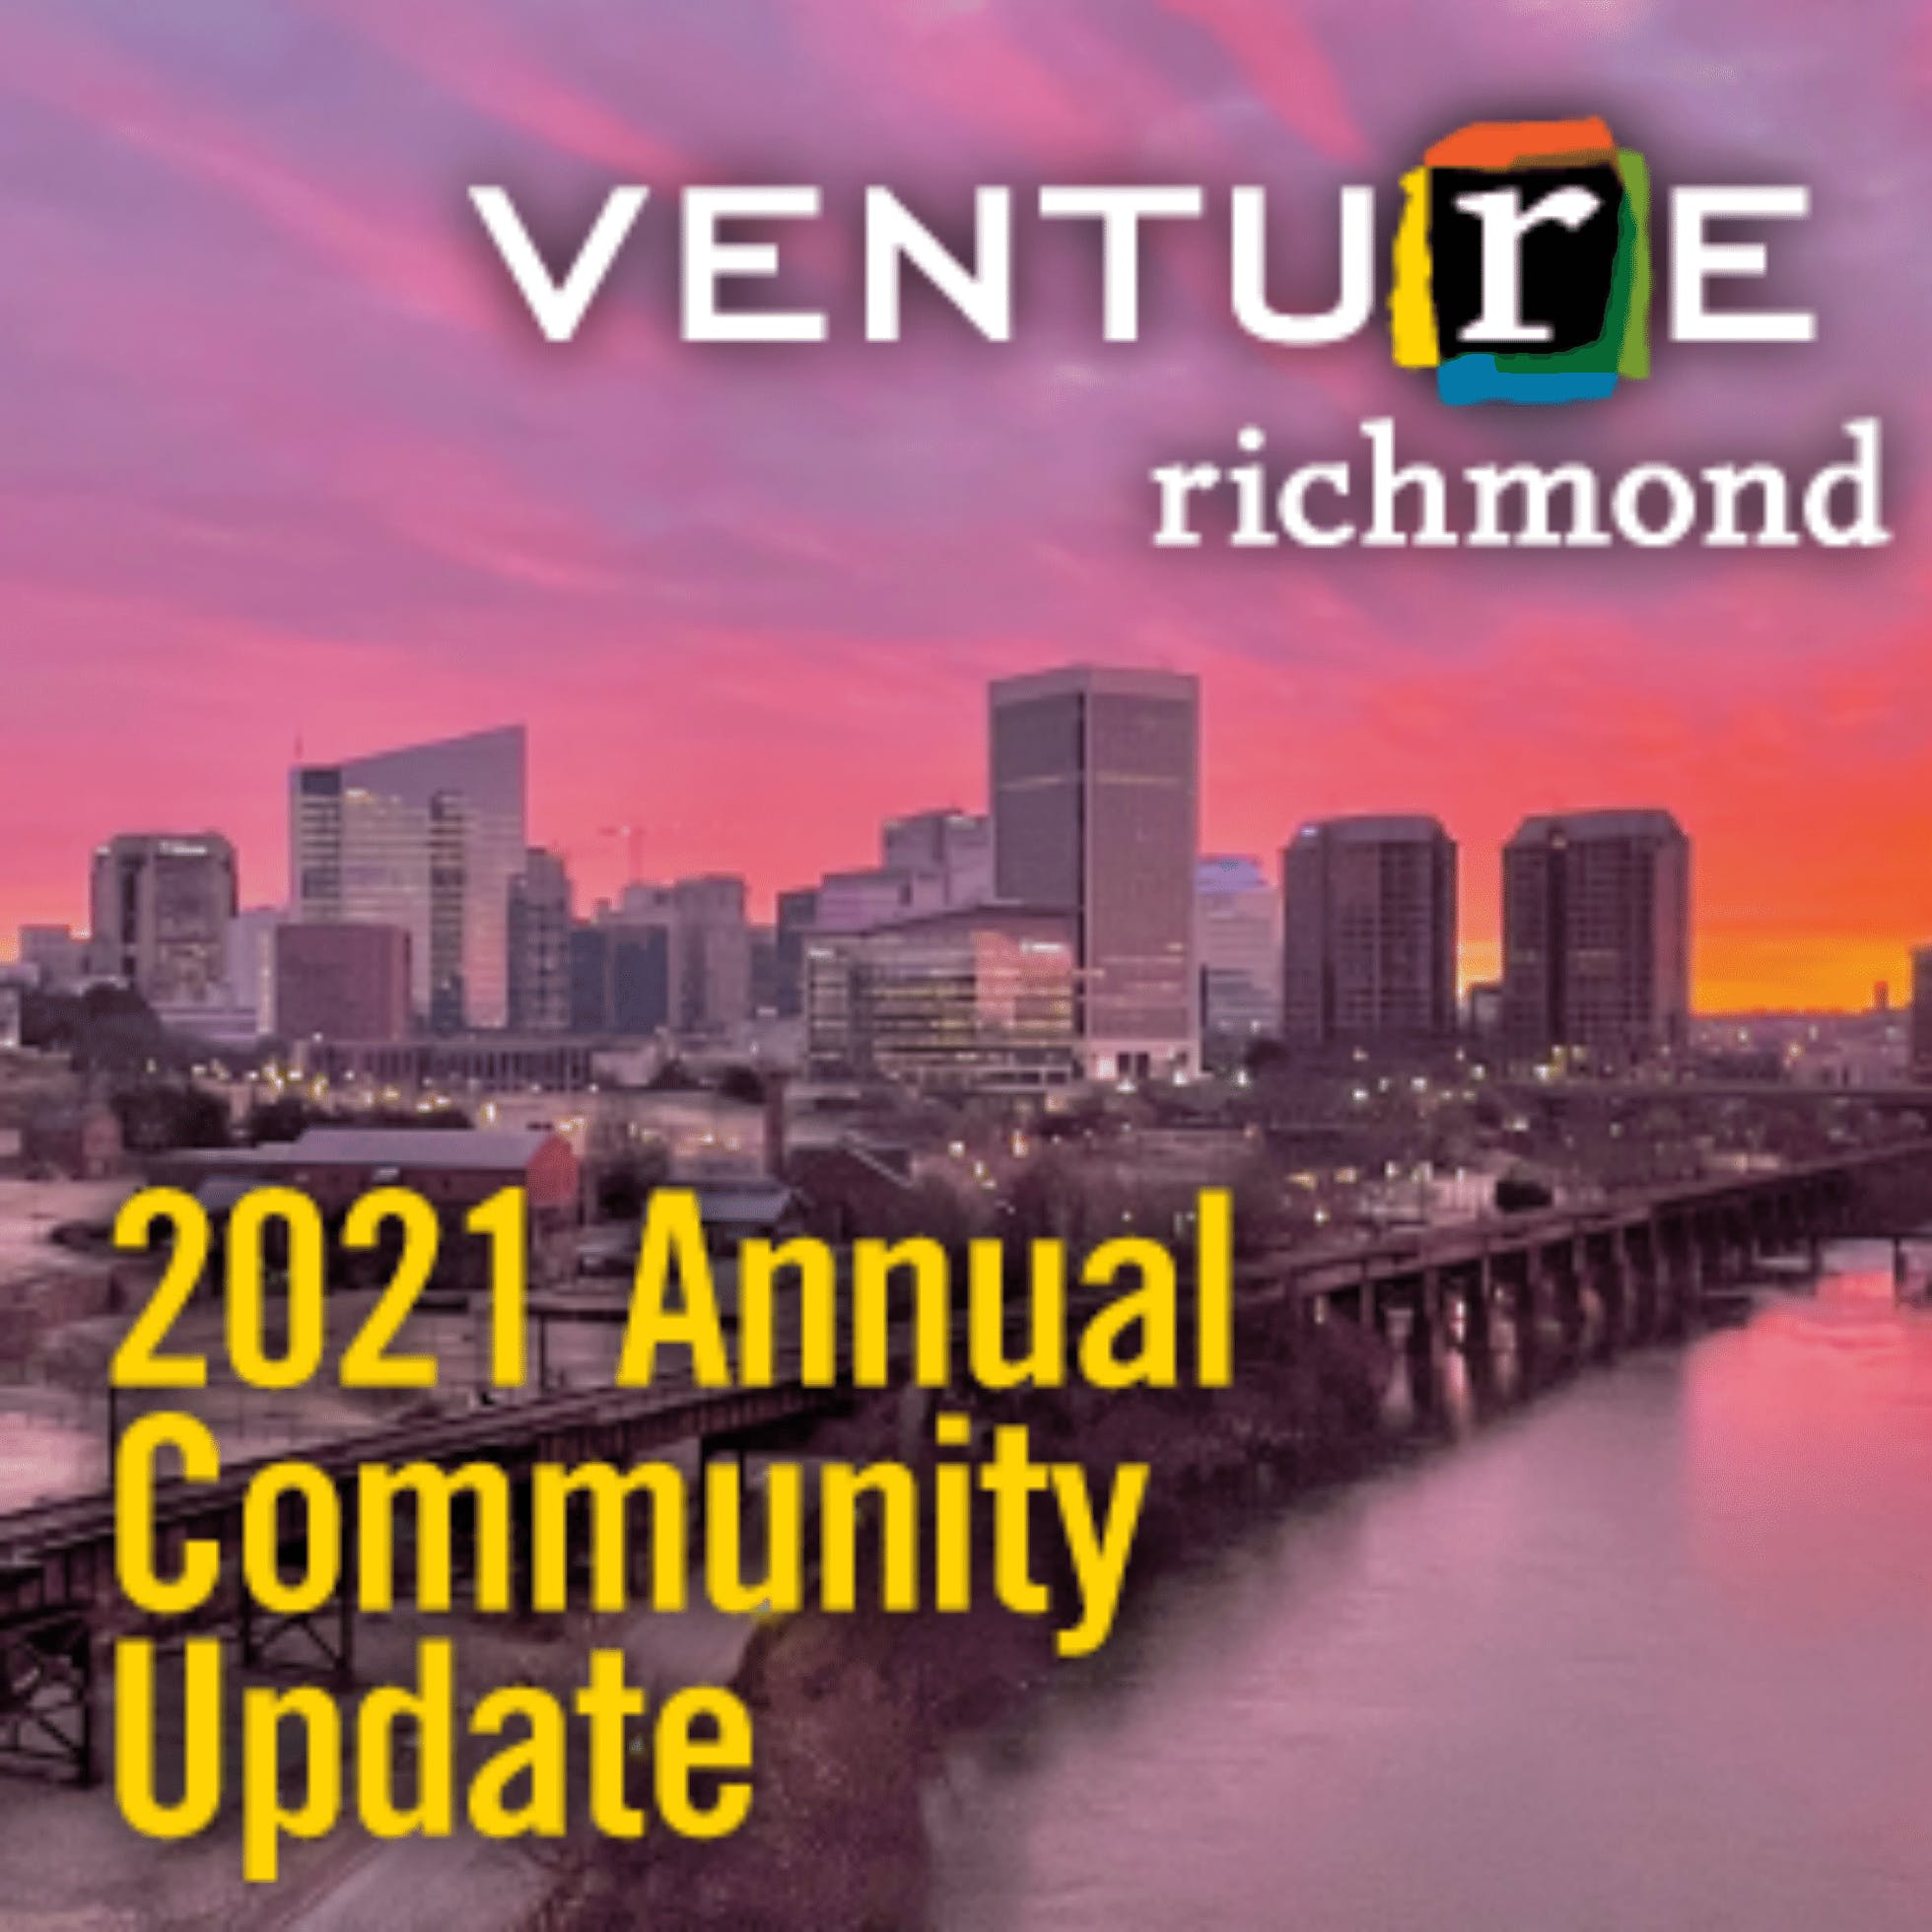 Venture Richmond 2021 Annual Community Update Meeting